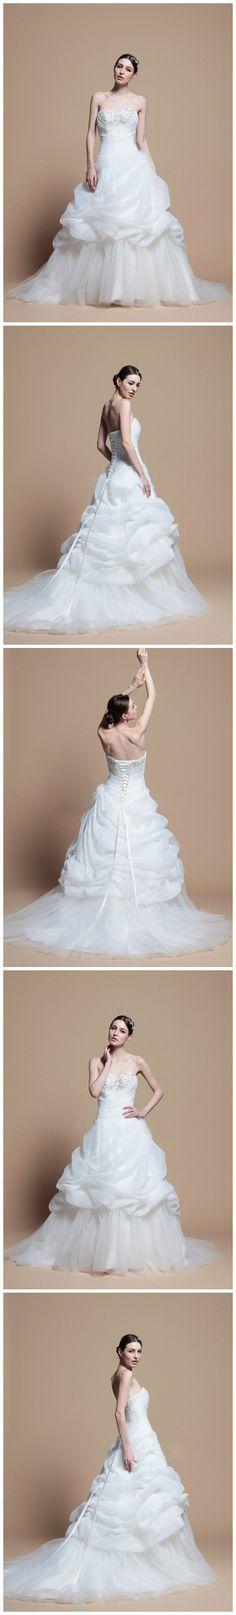 Sweetheart With Catch-Up Skirt Princess Wedding Dress